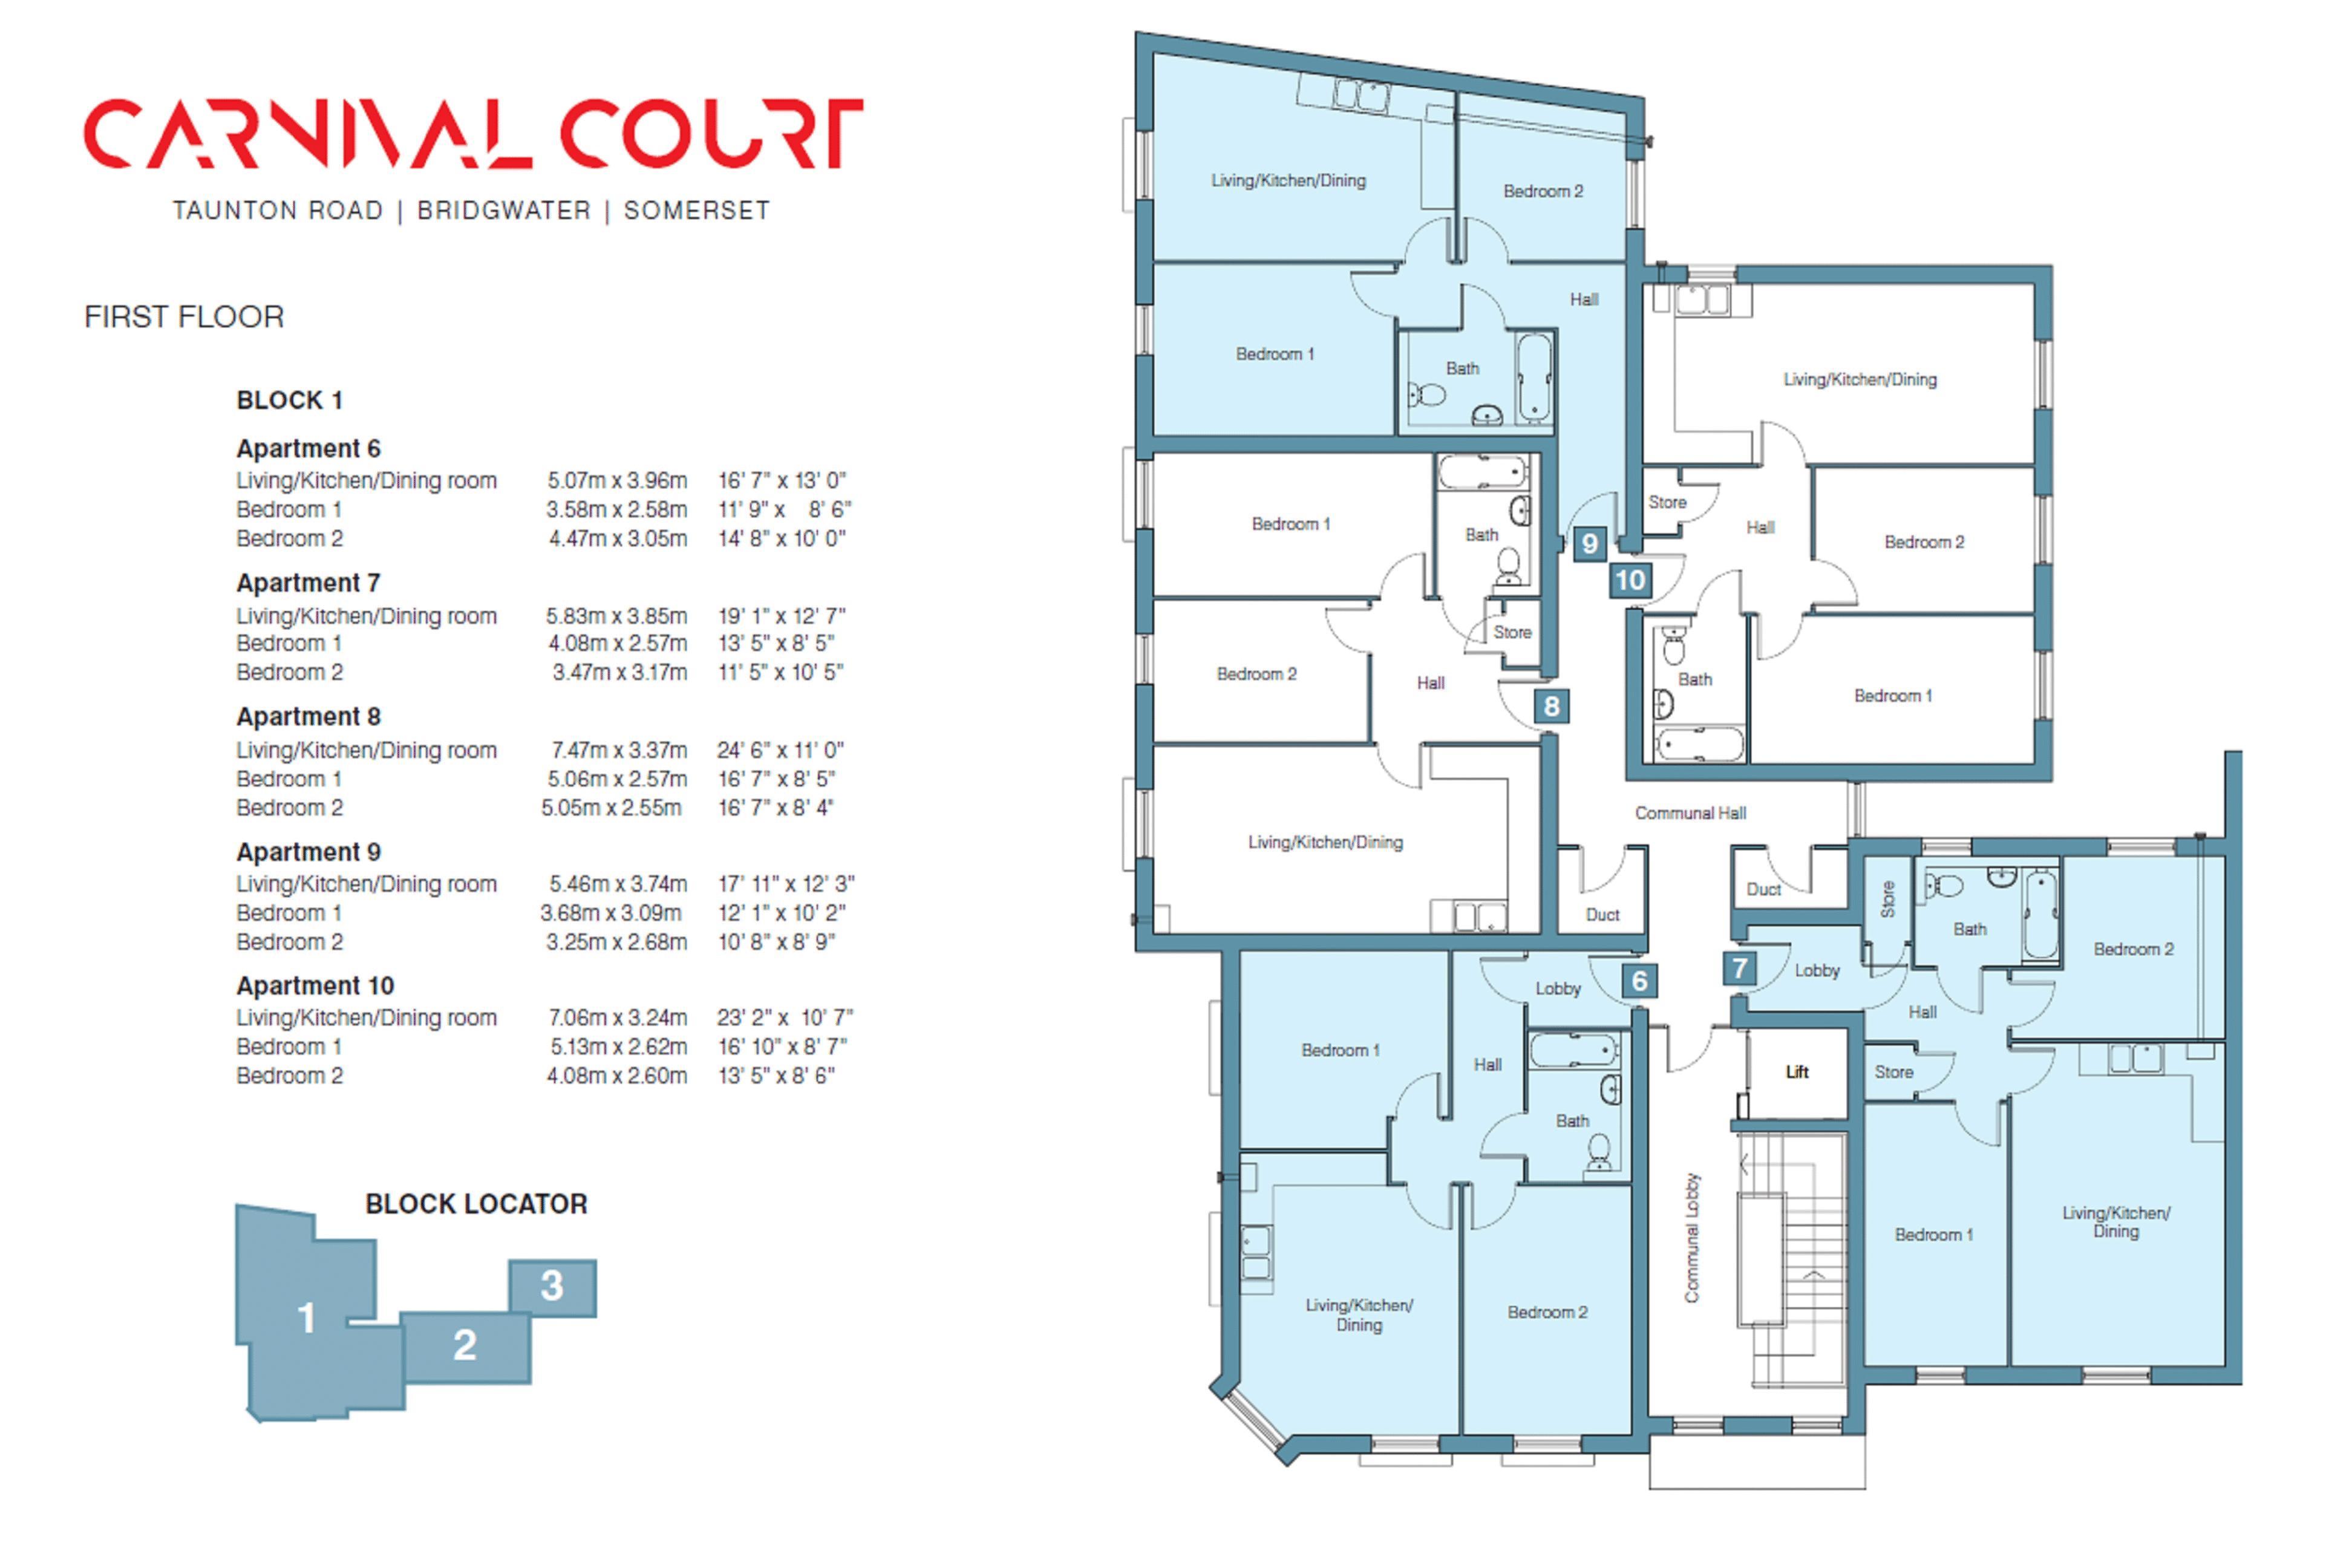 Apartment 7 Carnival Court, Taunton Road